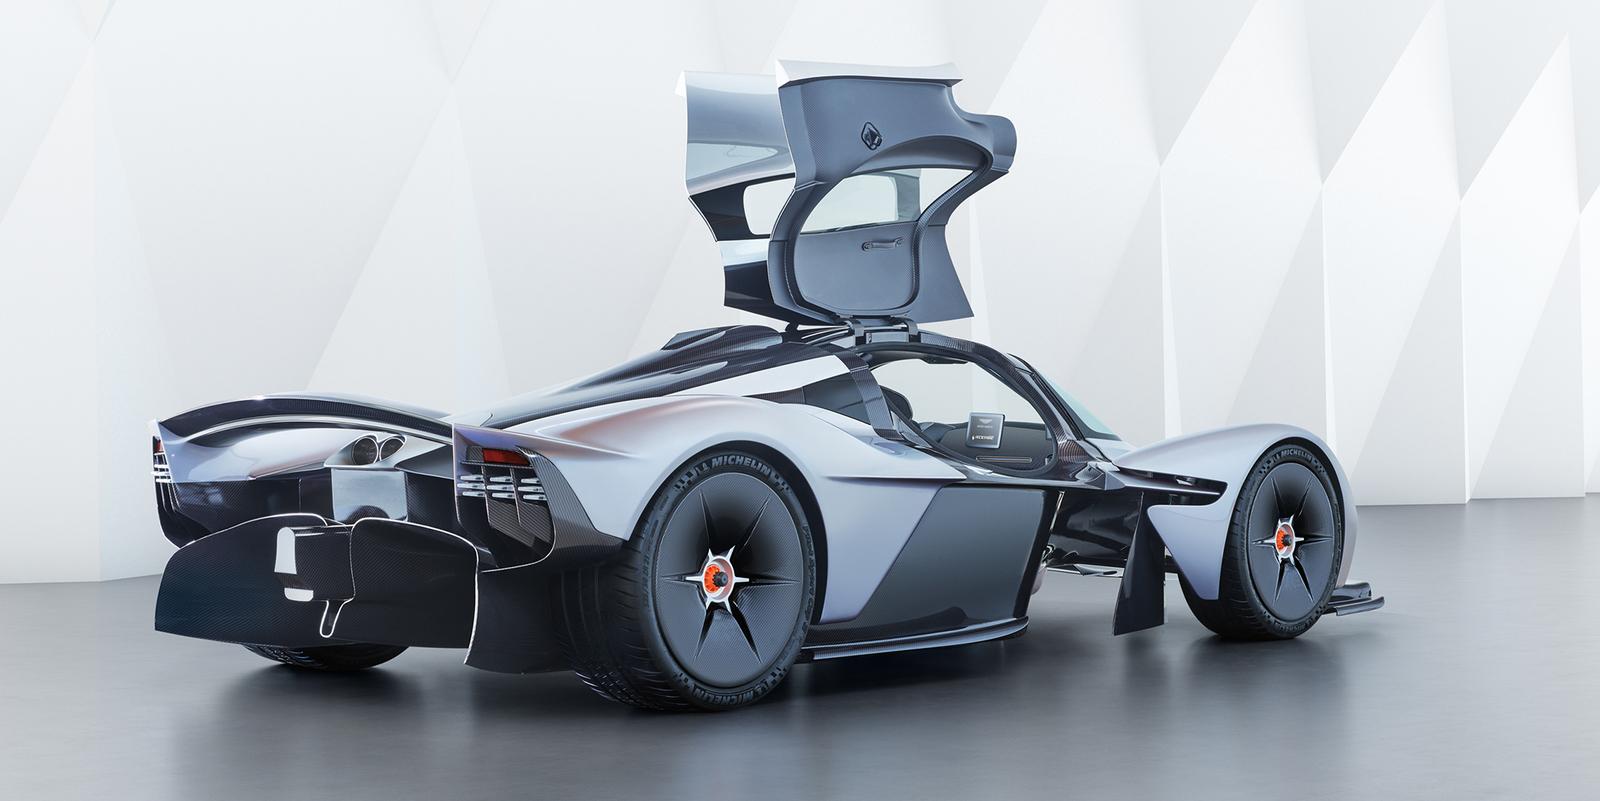 Aston Martin Luxury Car Spectre of Valkyrie